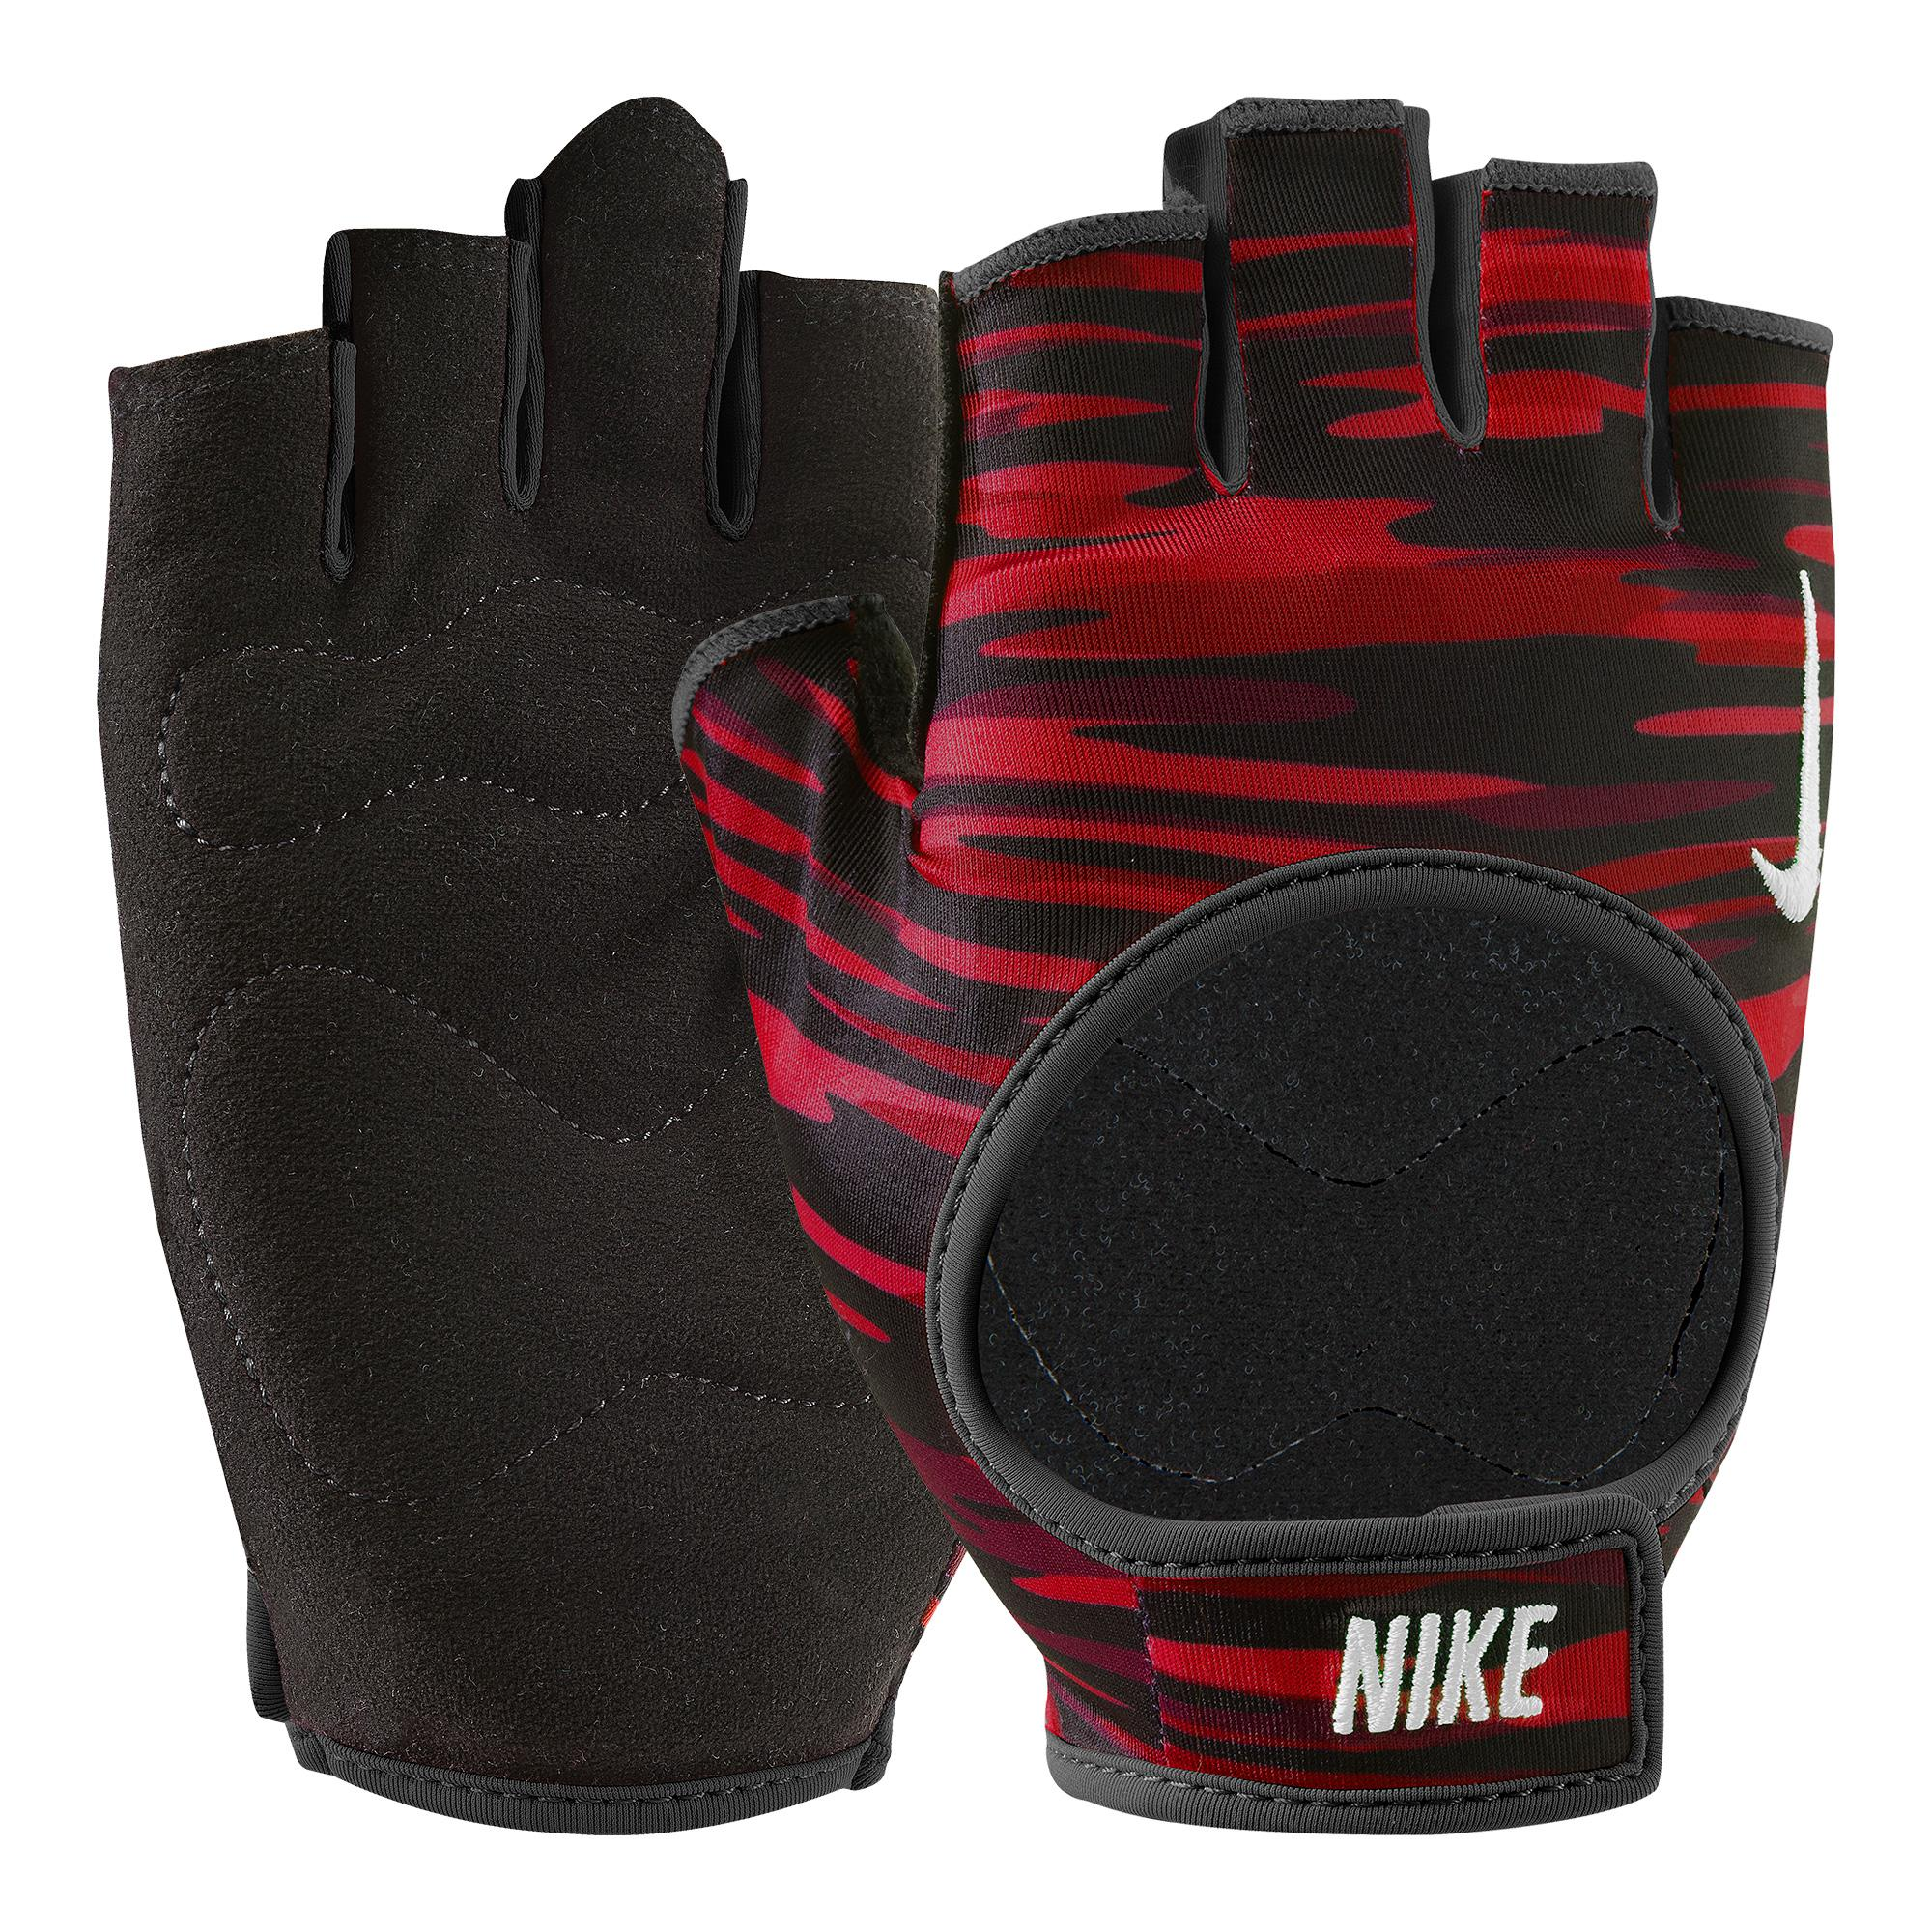 Nike Training Gloves Size Chart: Nike Womens Fit Training Gloves